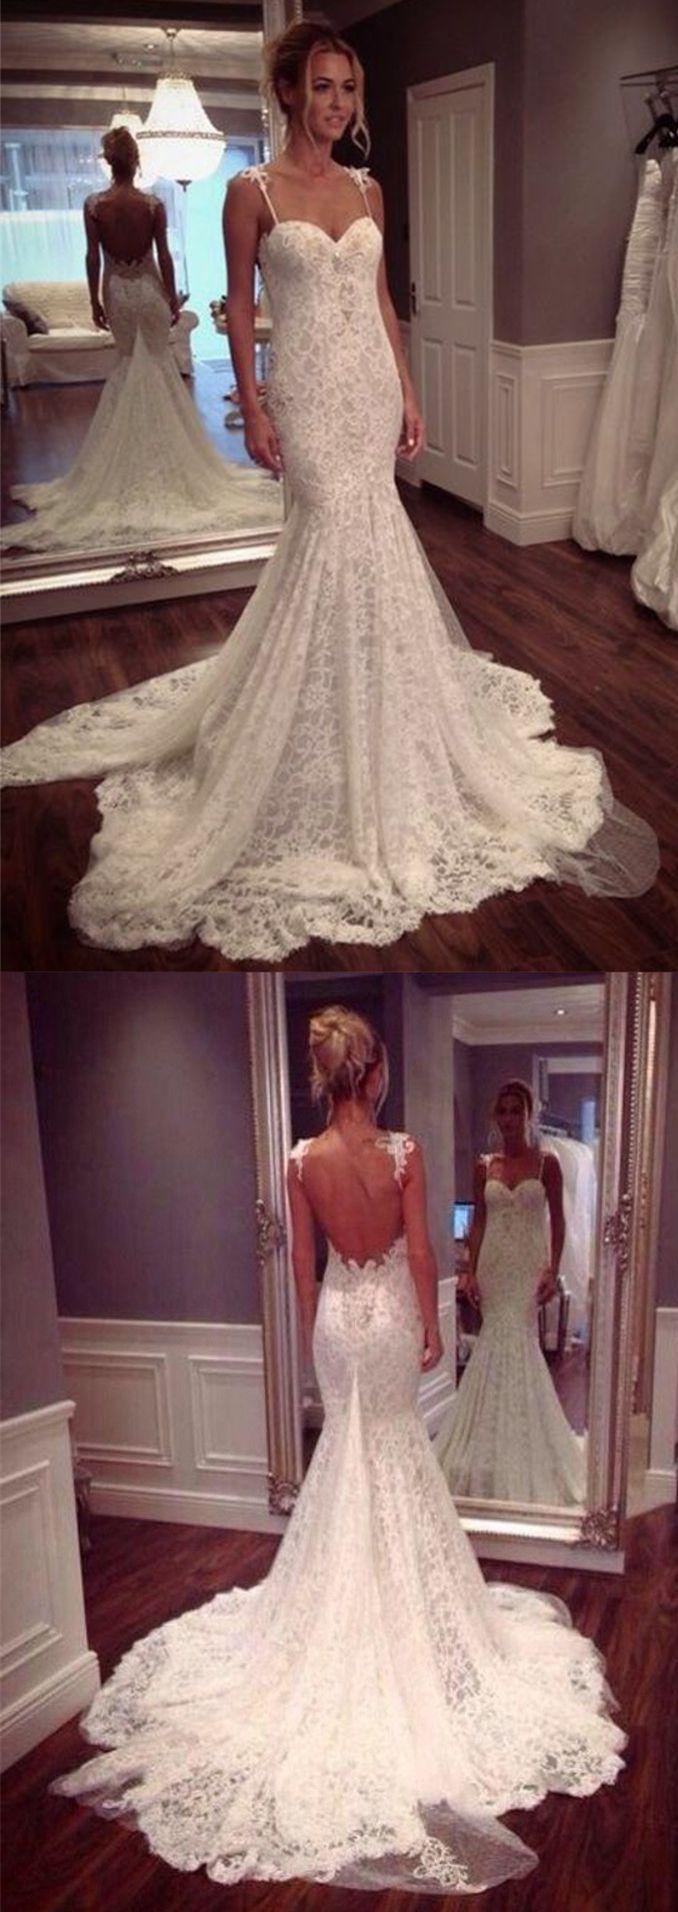 Elegant Spaghetti Straps Wedding Dresses Chapel Train Lace Y Party Mermaid Bodycon Dress